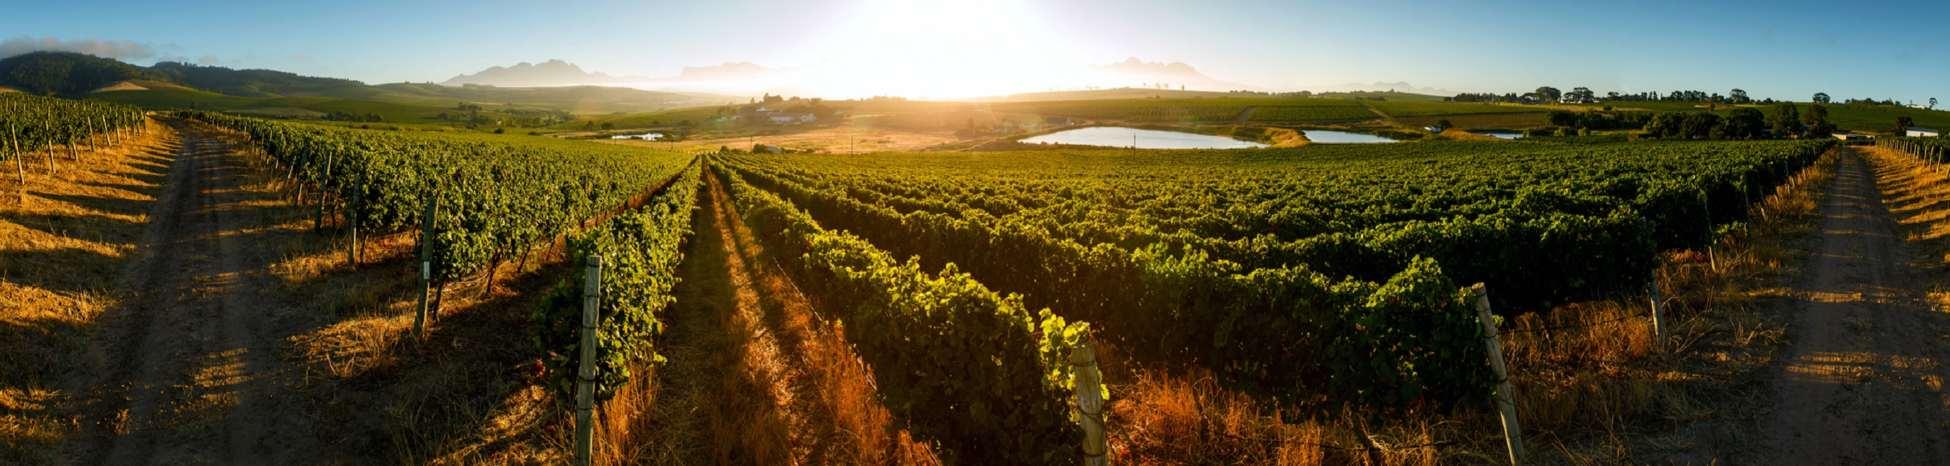 Mulderbsoch-Vineyards_panoramic